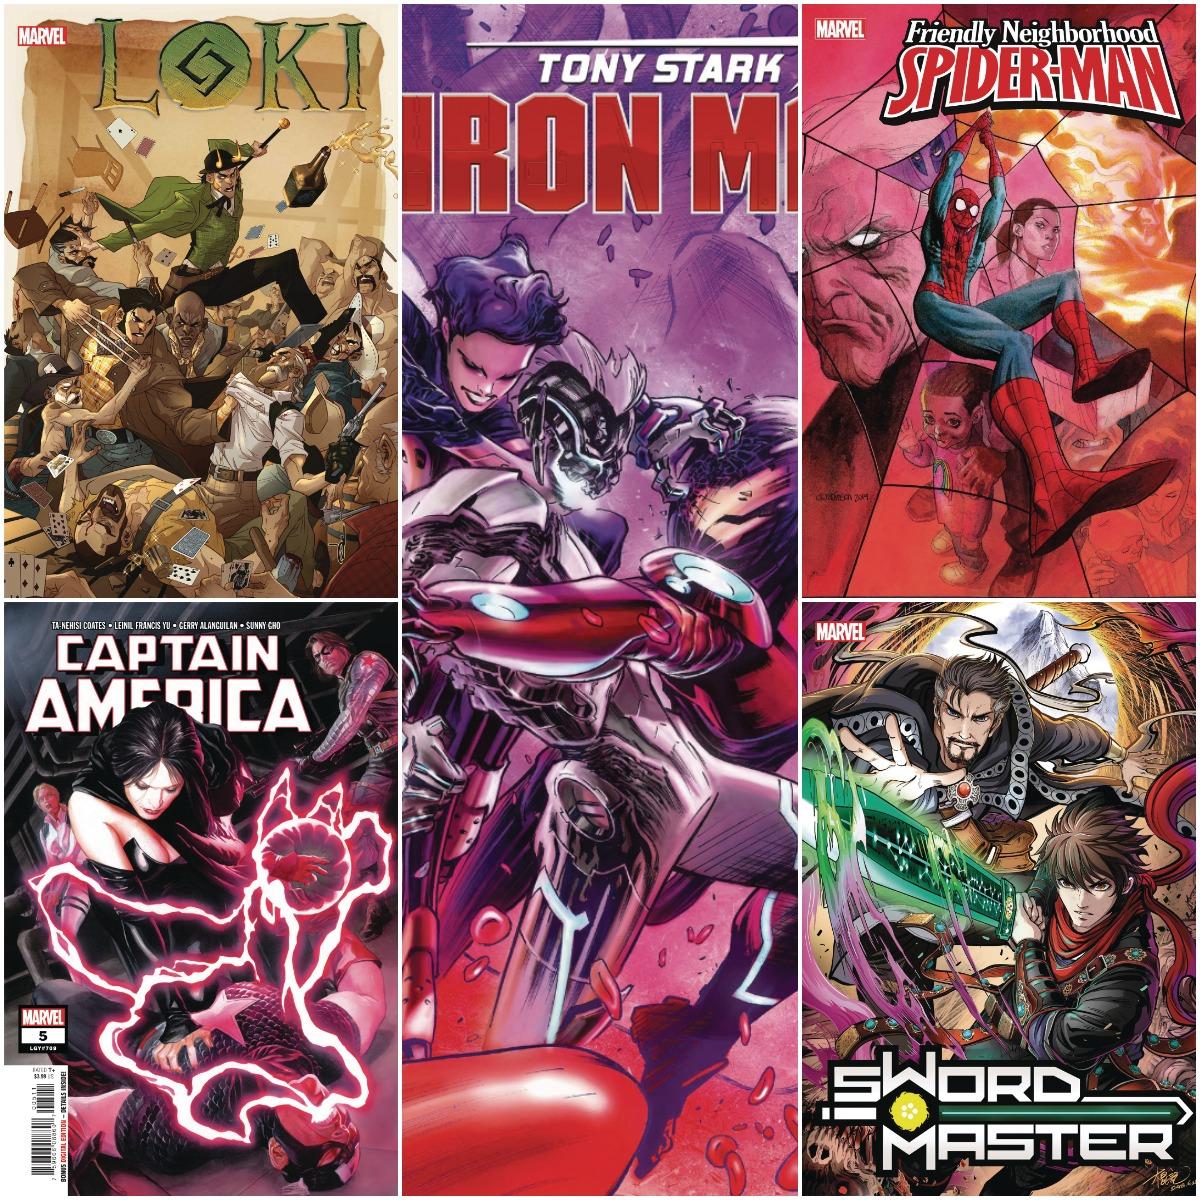 Marvel Creative Ch-Ch-Changes to Tony Stark: Iron Man, Friendly Neighborhood Spider-Man, Sword Master, Captain America and Loki